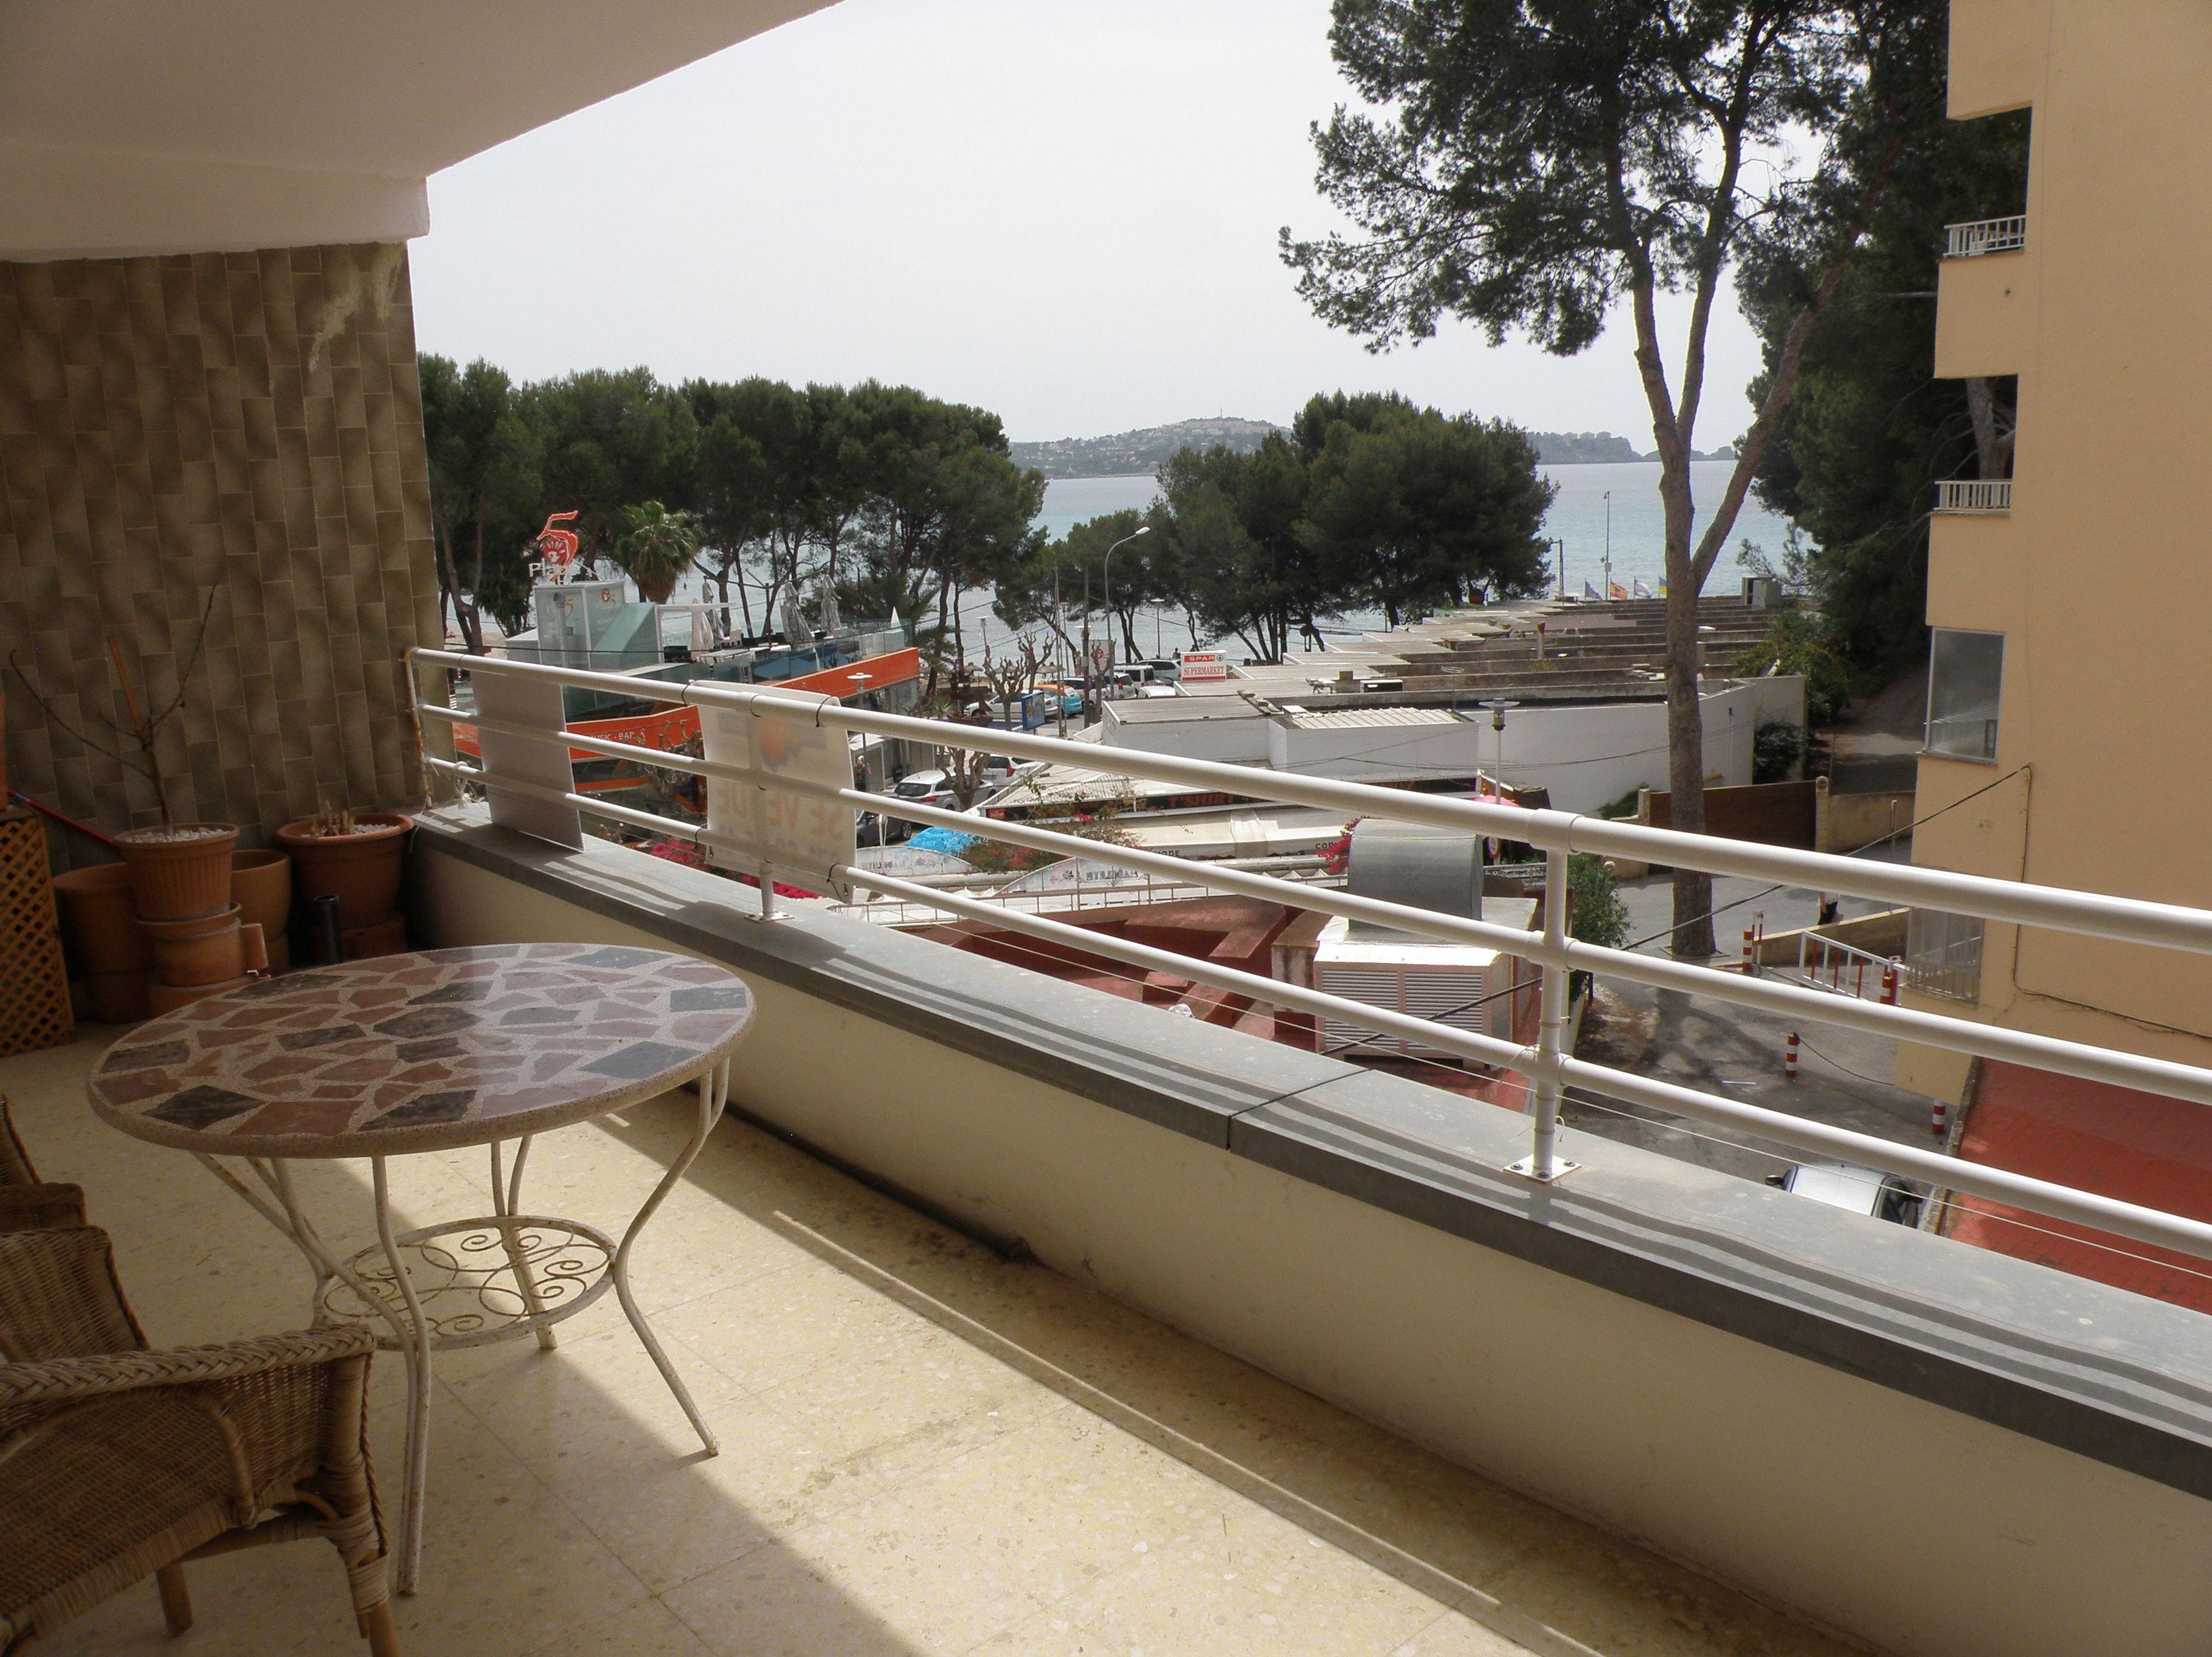 Apartamento Paguera Ref. 105 Precio: 349.500€: InfoHouseServices Inmobiliaria de Info House Services